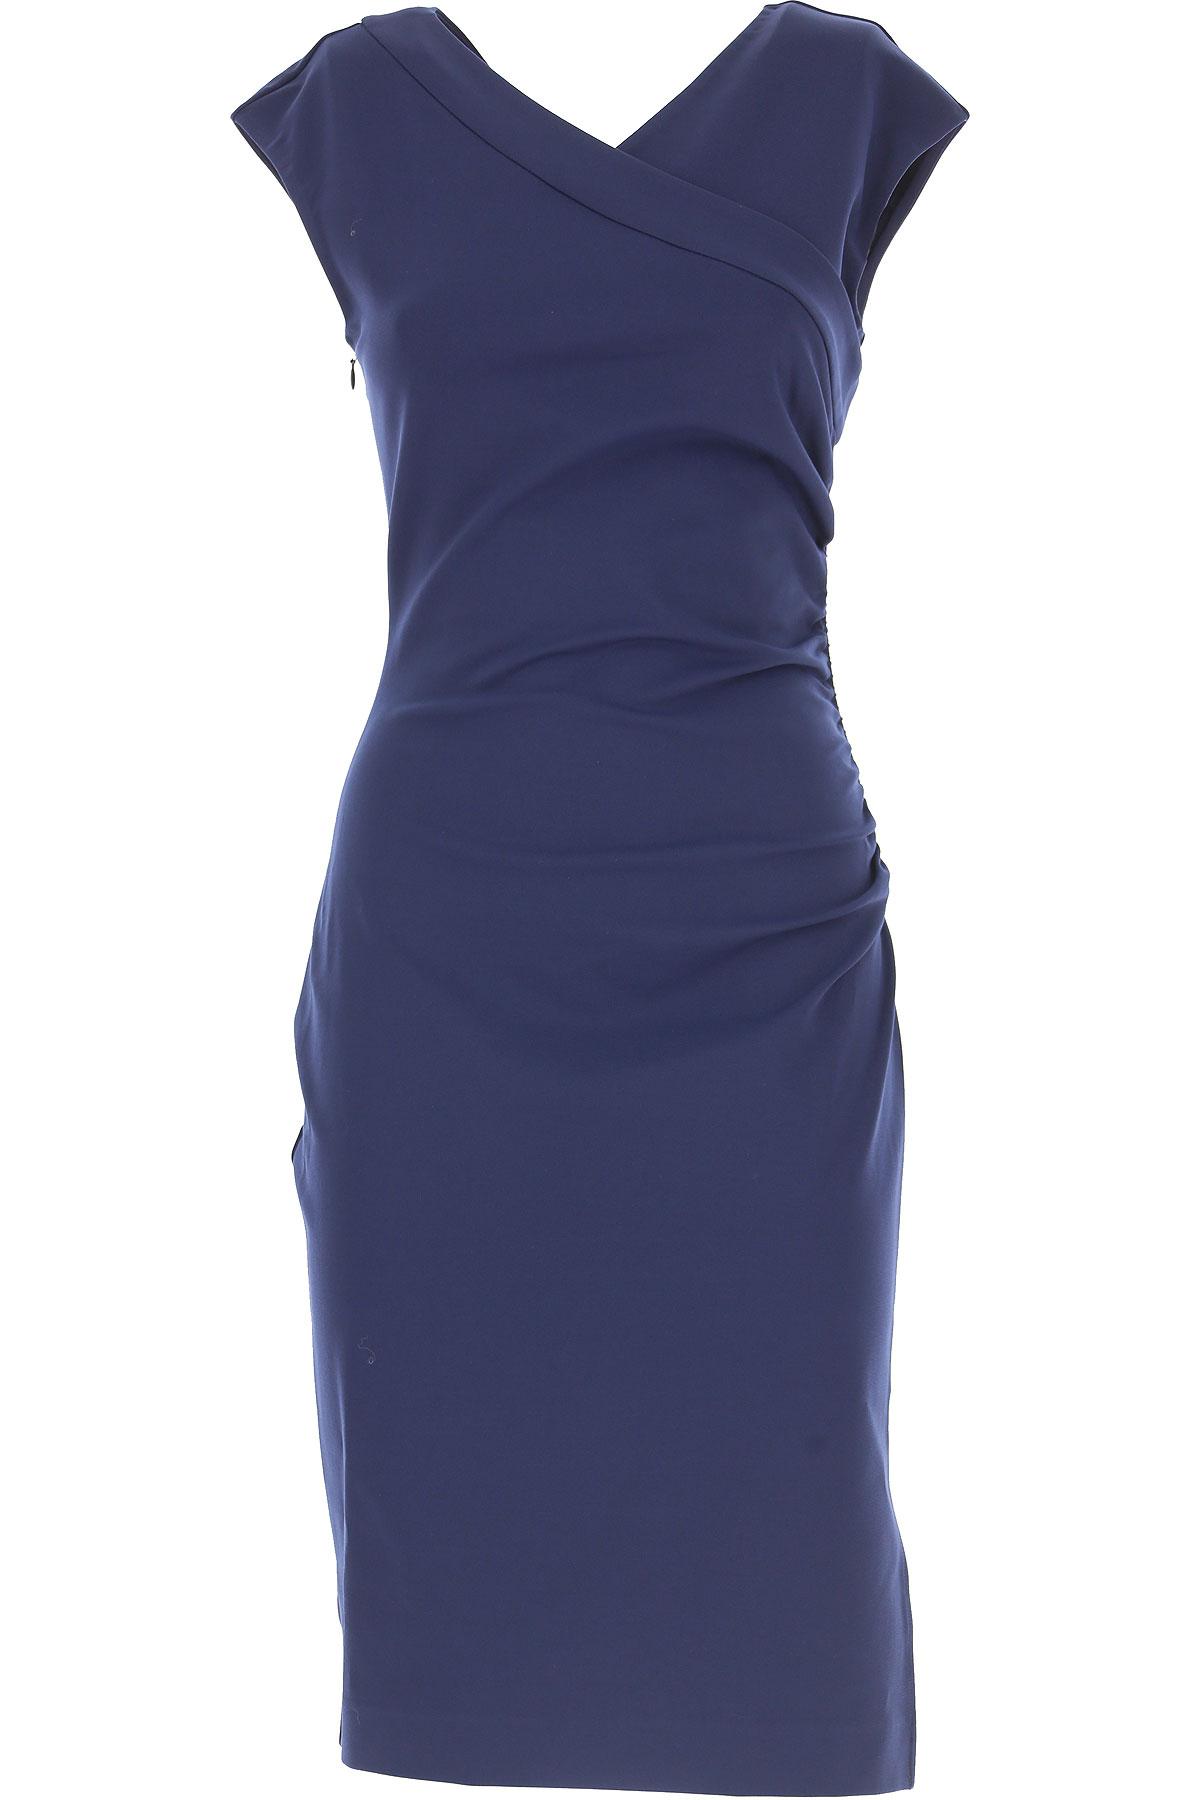 Image of Diane Von Furstenberg Dress for Women, Evening Cocktail Party, navy, Viscose, 2017, USA 4 - IT 40 USA 6 - IT 42 USA 8 - IT 44 USA 10 - IT 46 USA 12 - IT 48